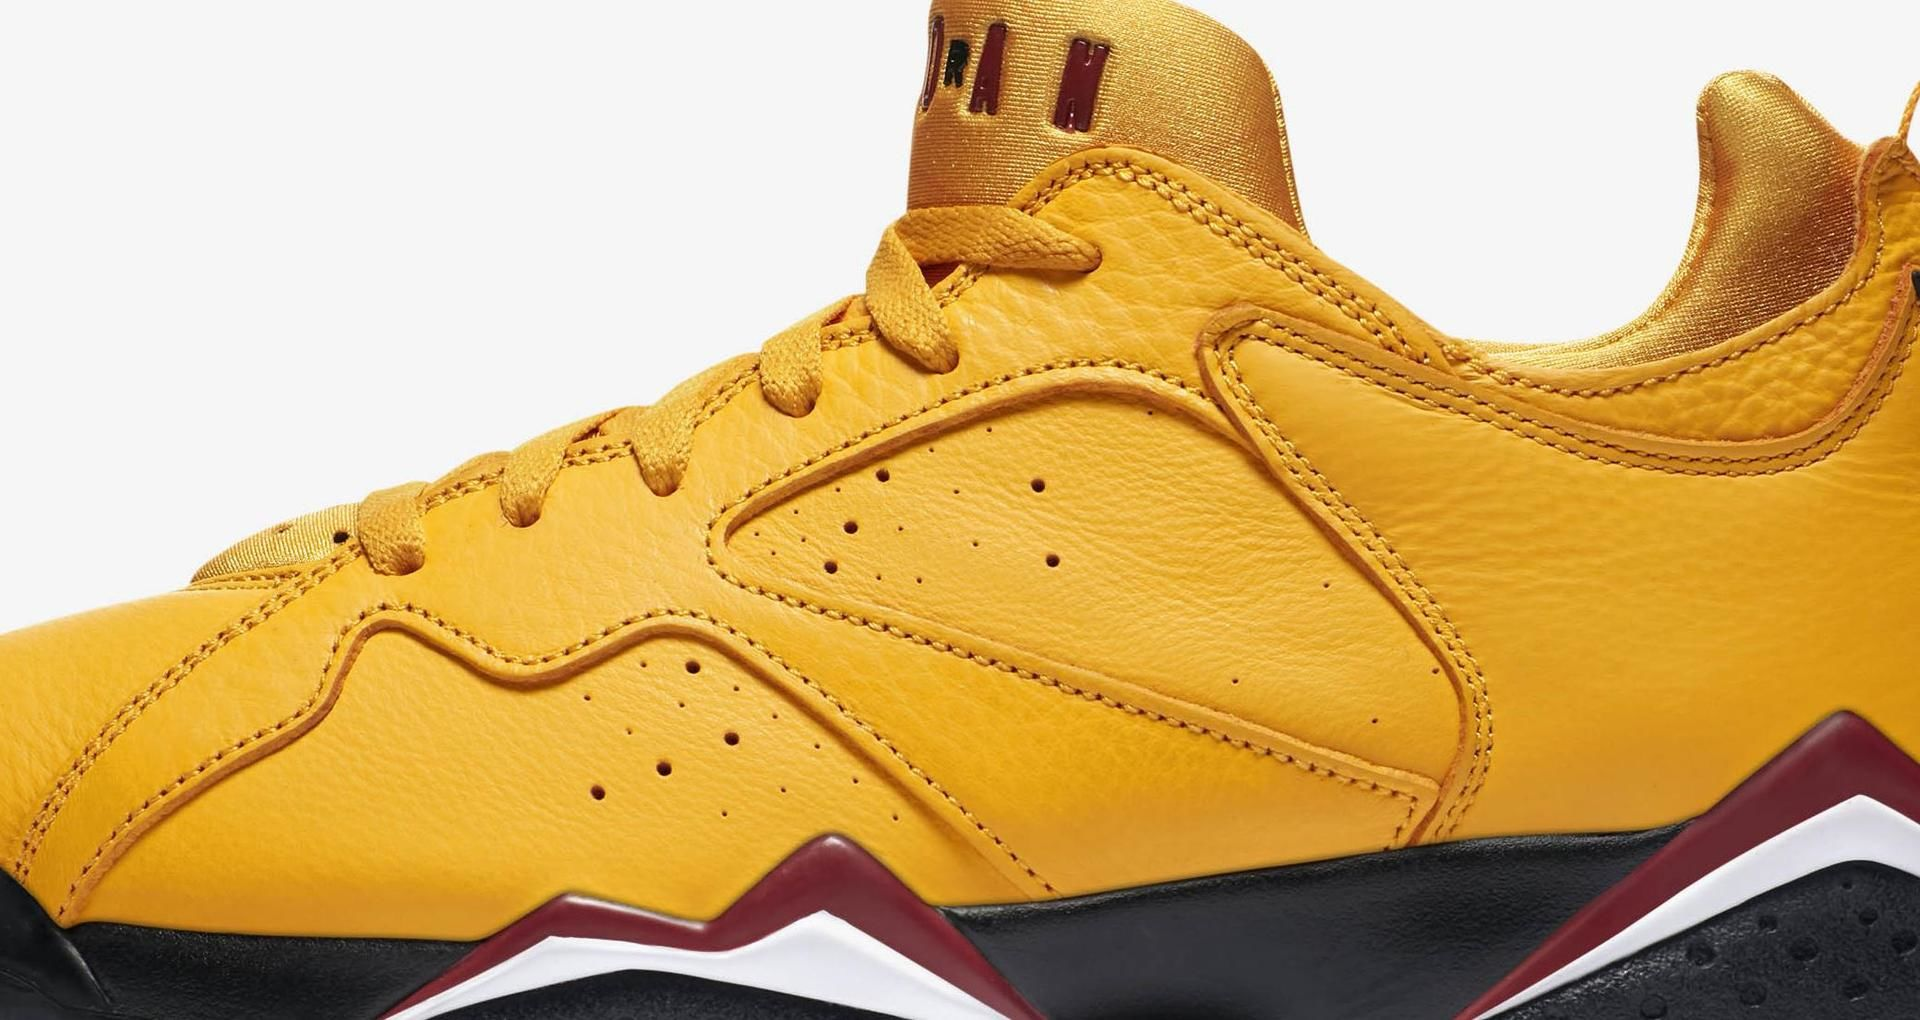 8180834463154c Air Jordan VII Low NRG  Taxi  Release Date. Nike+ SNKRS